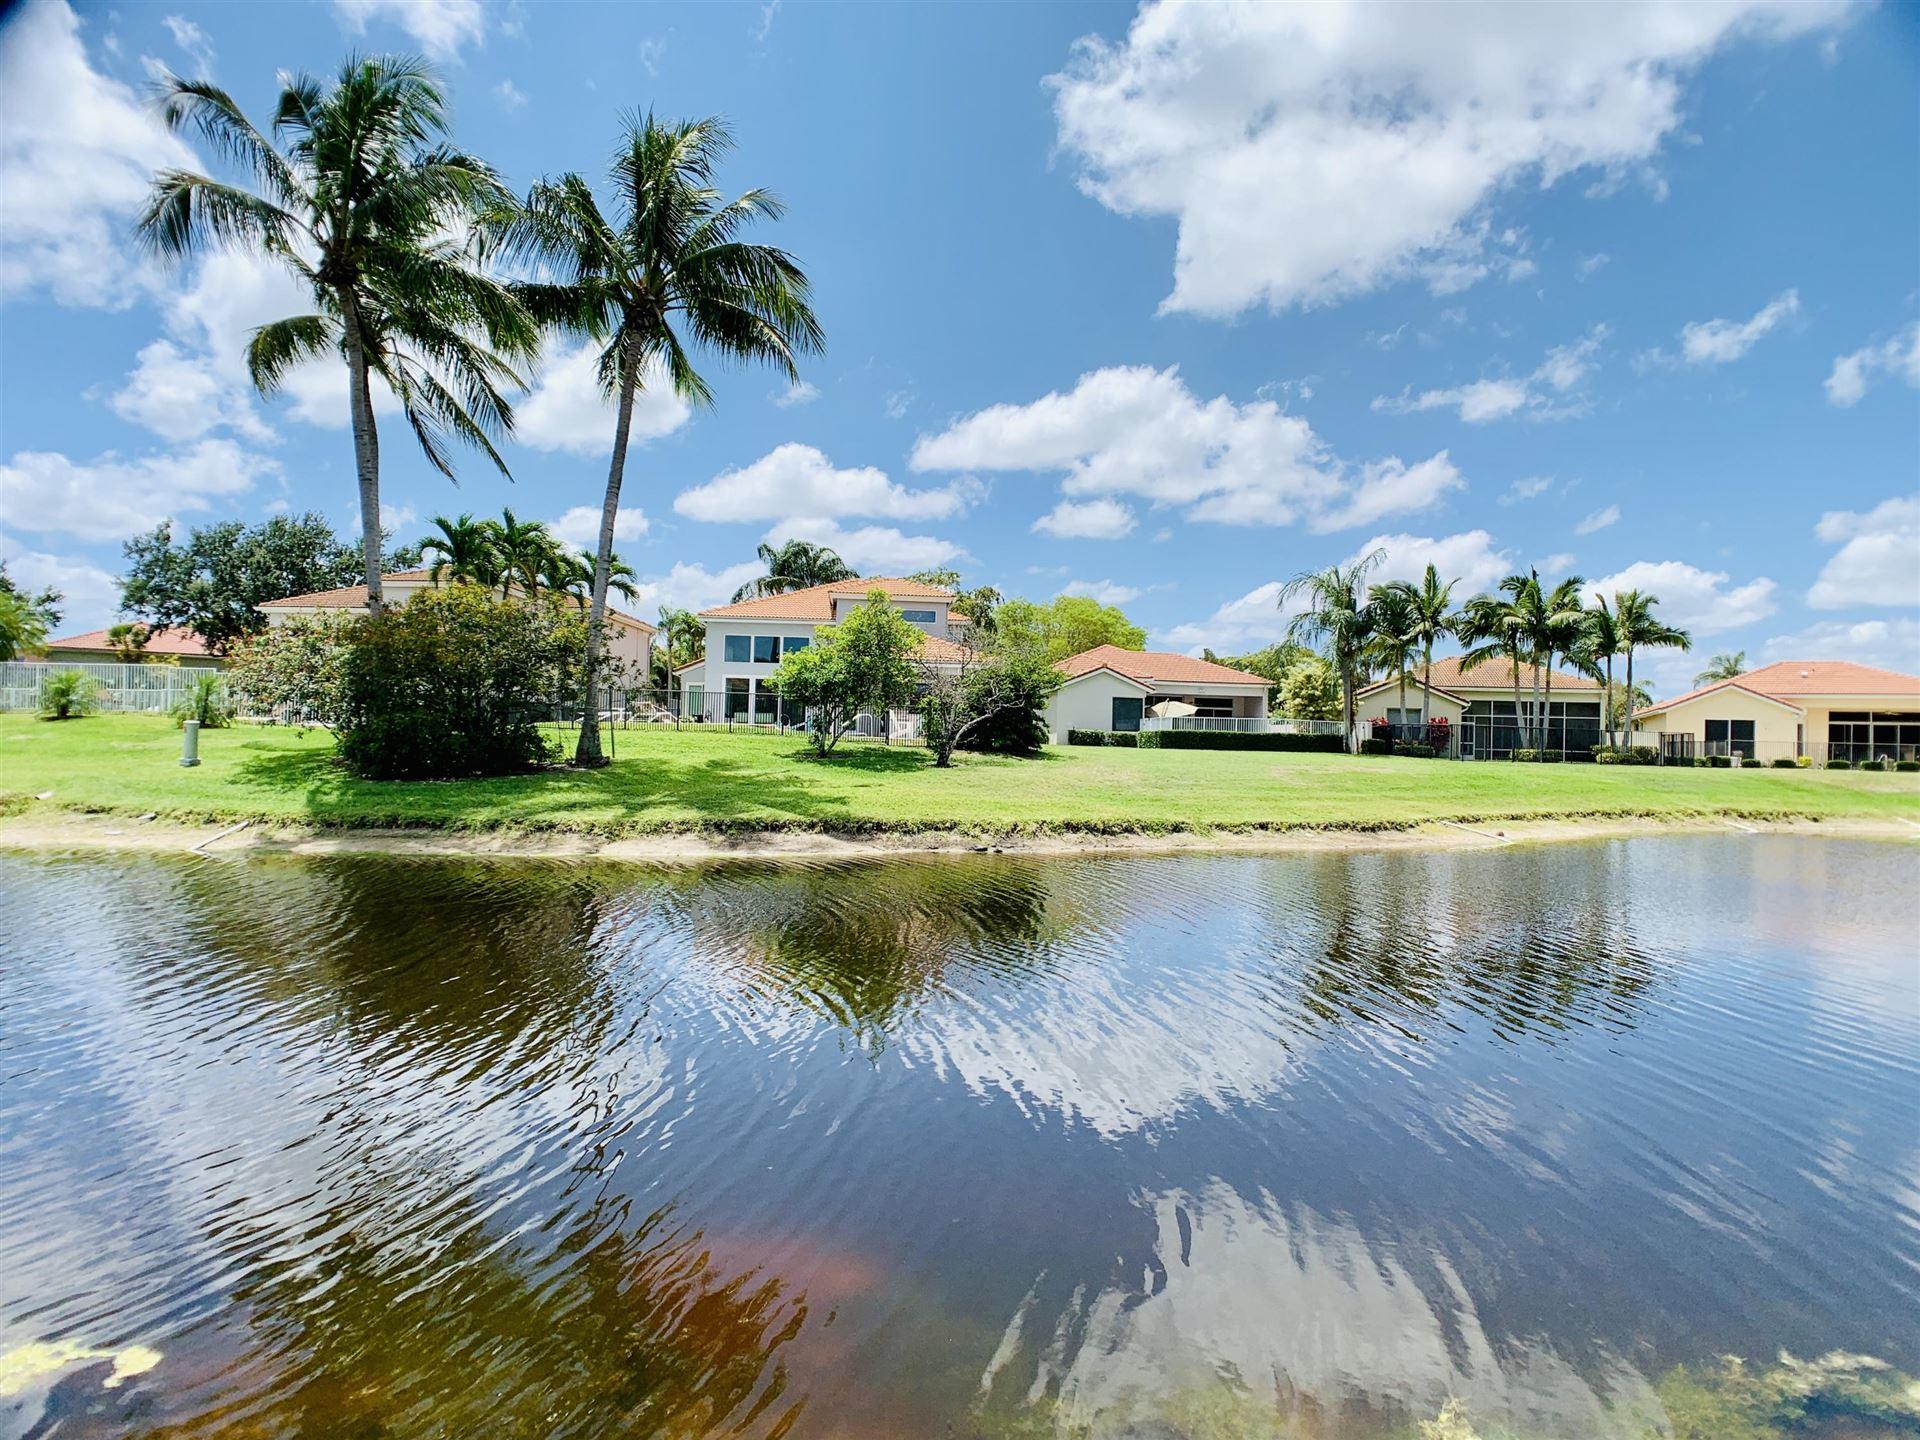 6694 Portside Drive, Boca Raton, FL 33496 - MLS#: RX-10712155